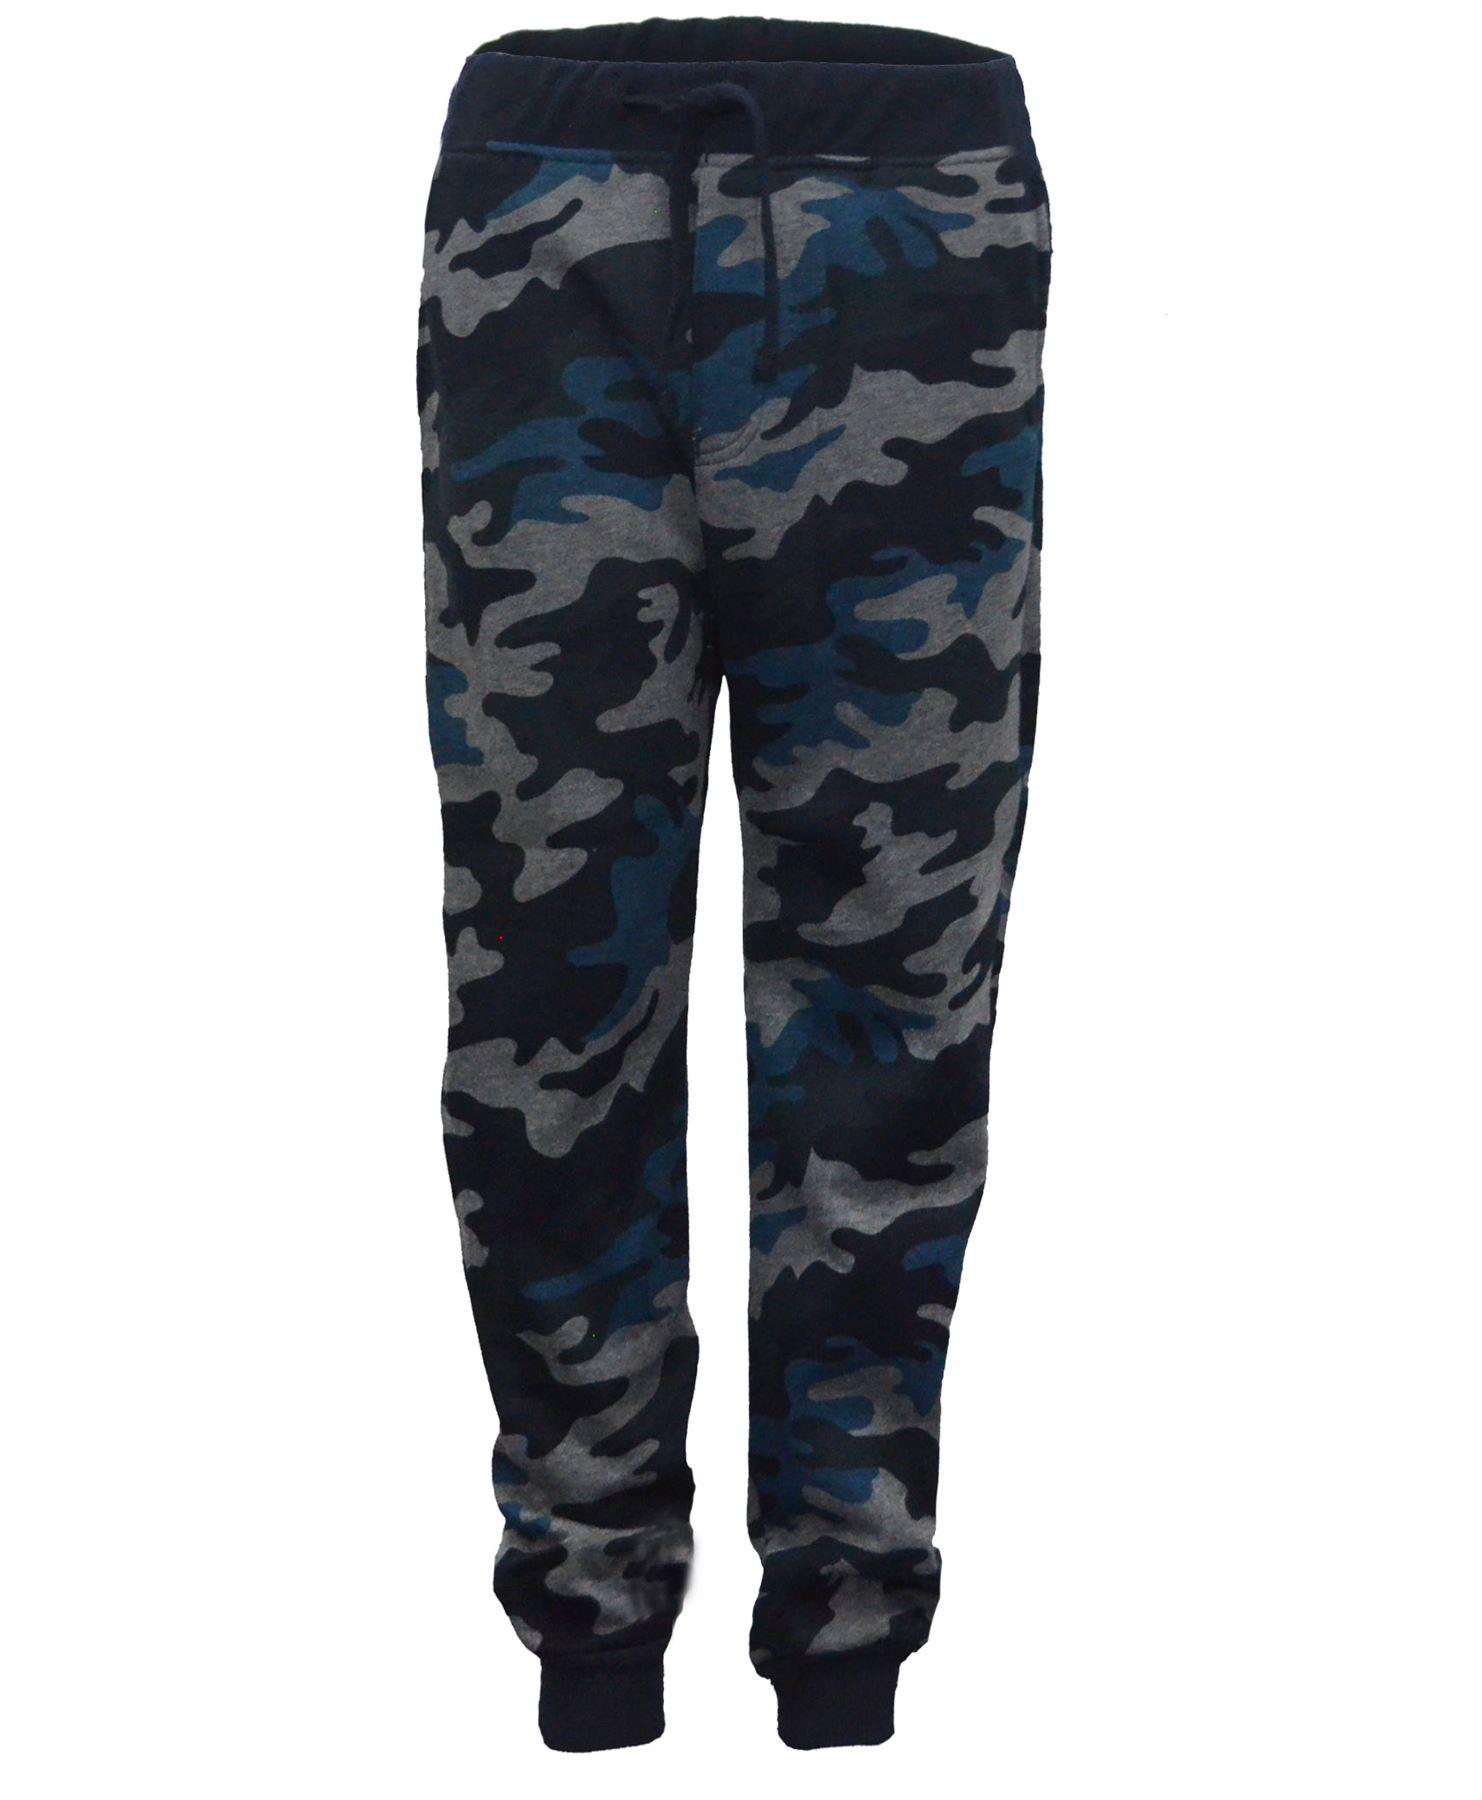 Kids Camo Print Jogging Trousers Girls Boys Sweatpants Bottoms Tracksuit 3-14 Y